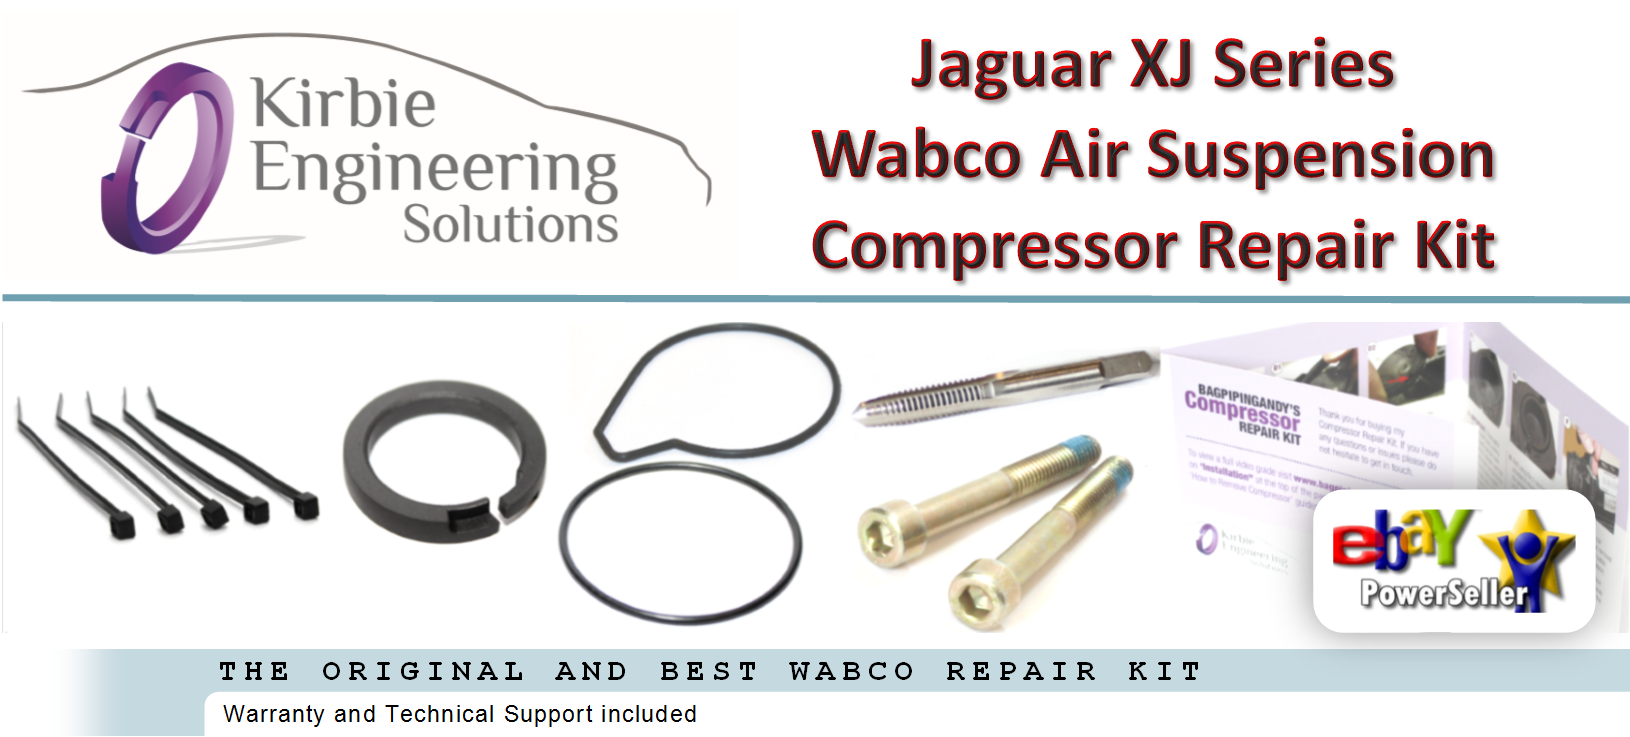 jaguar xj6 xj8 xjr 350 x suspension pneumatique compresseur pompe joint ebay. Black Bedroom Furniture Sets. Home Design Ideas